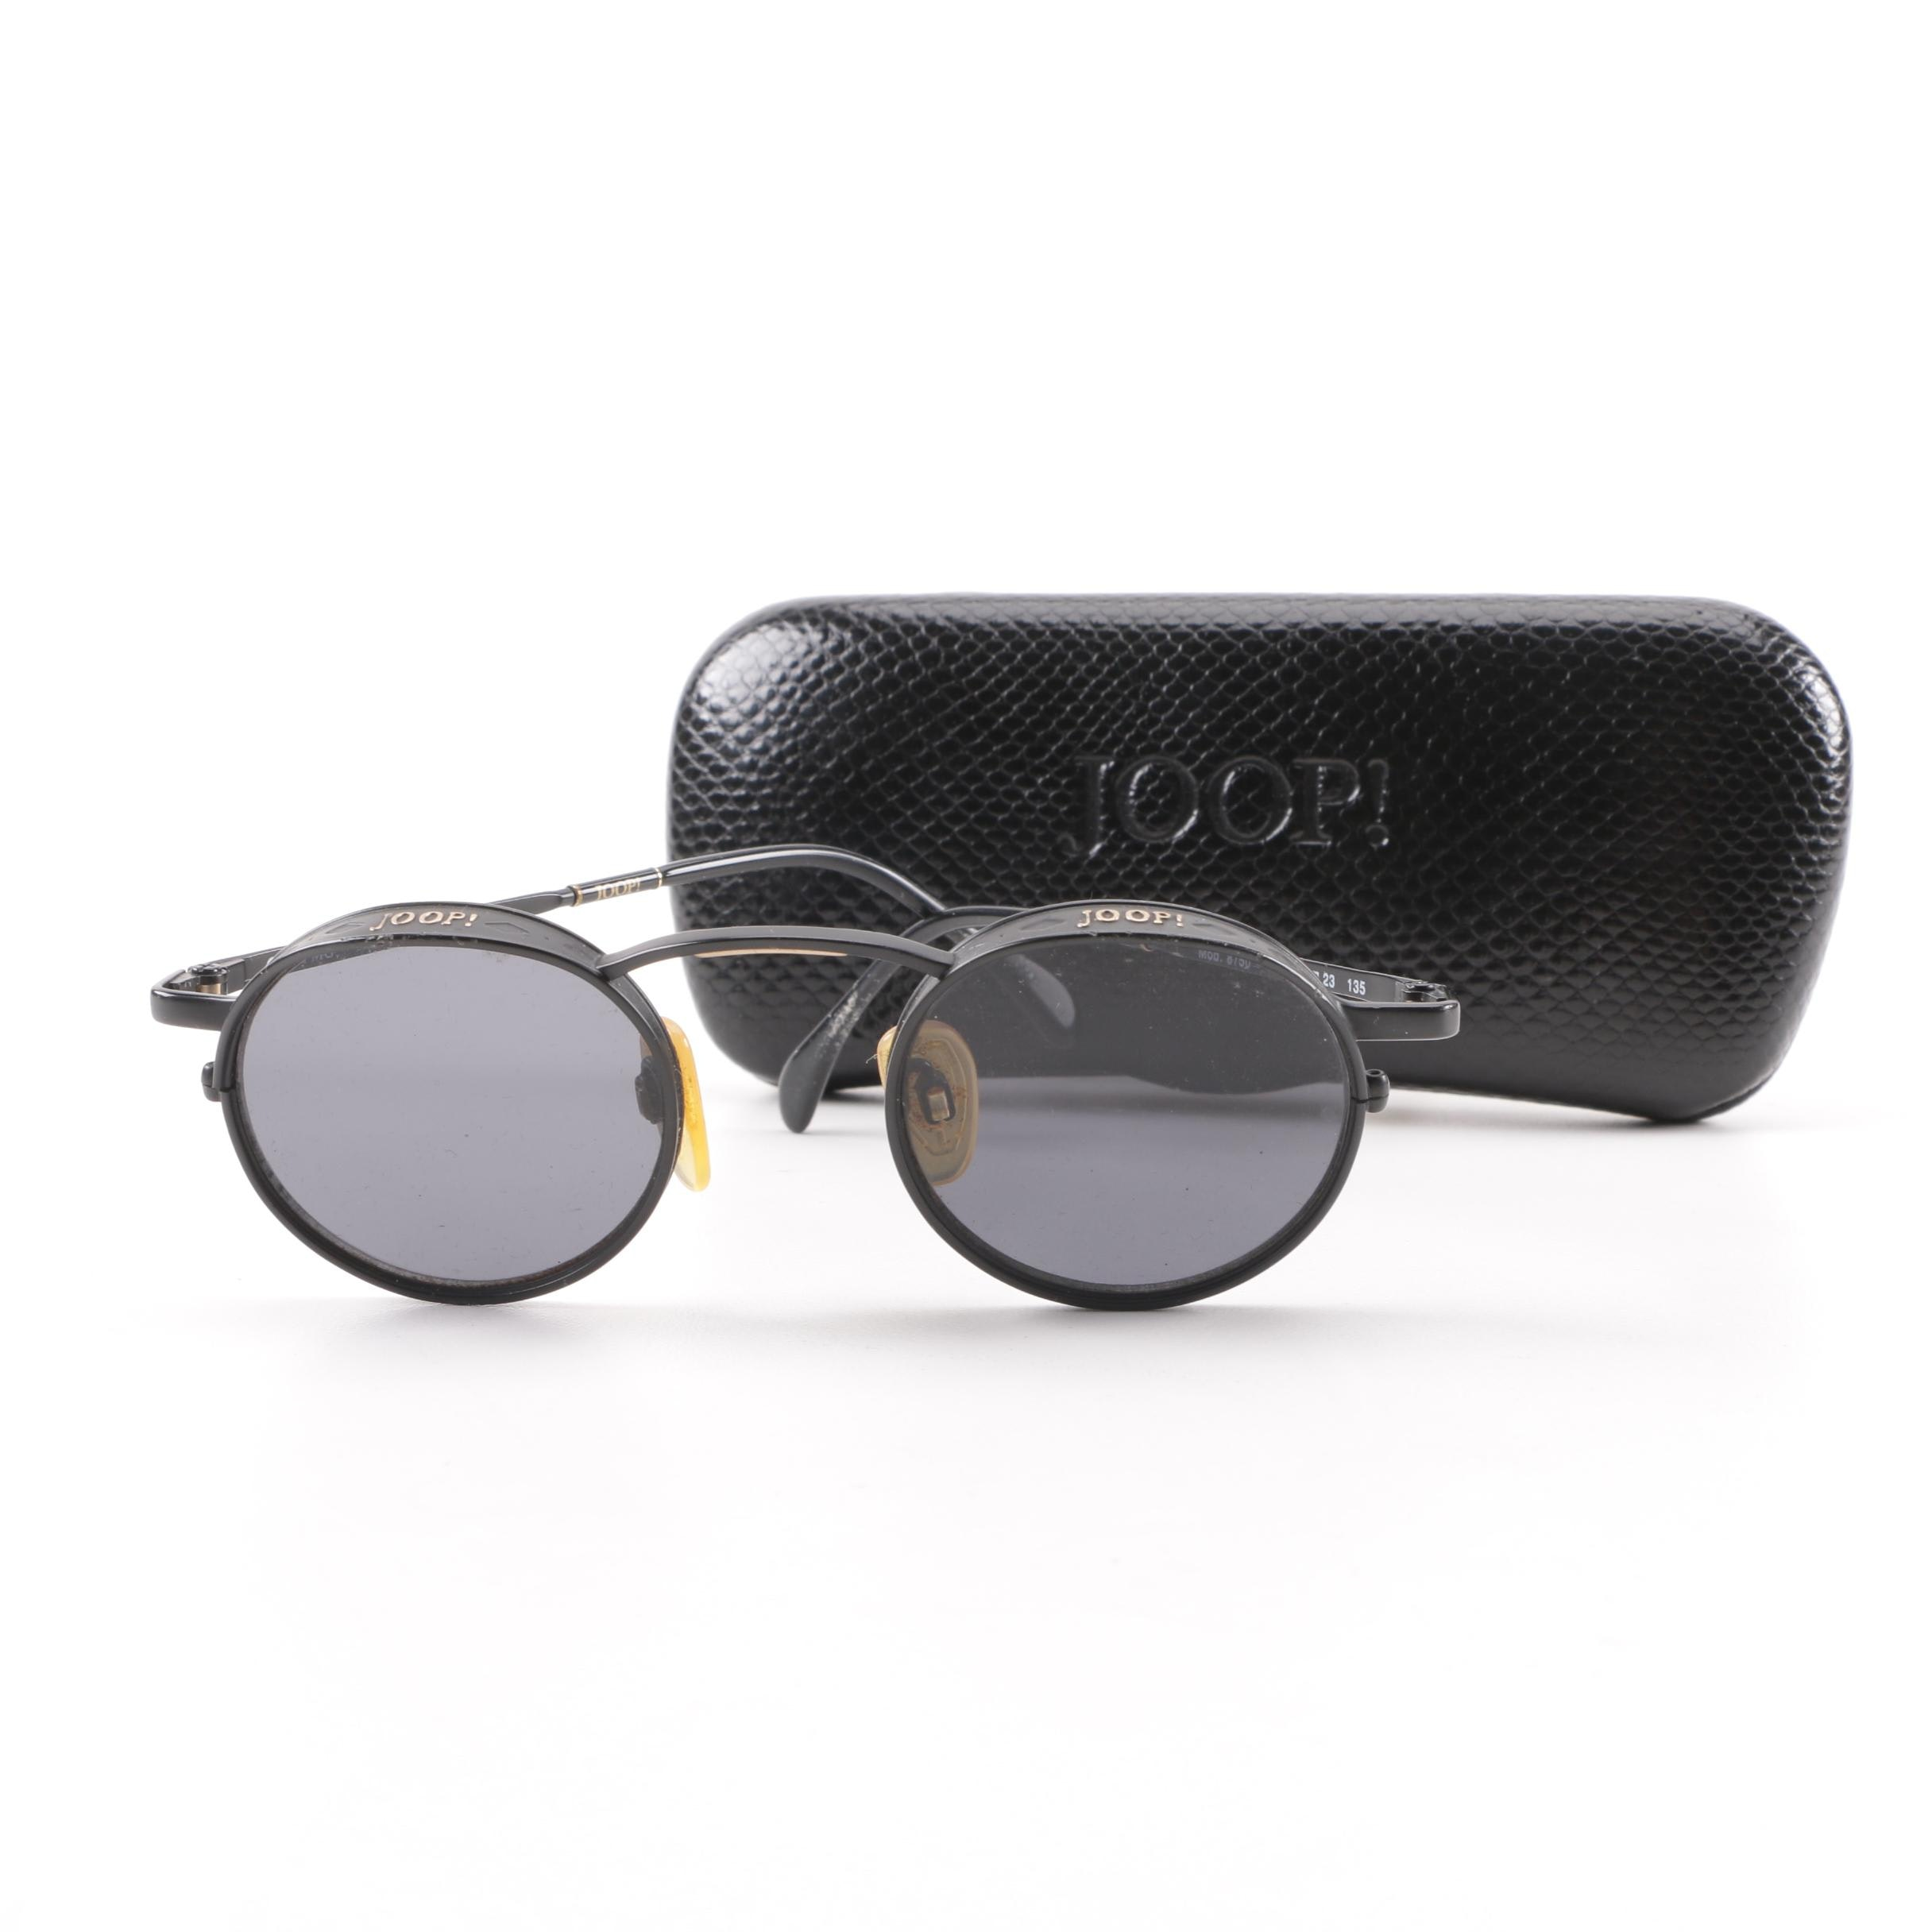 Joop! 8750 Sunglasses with Case